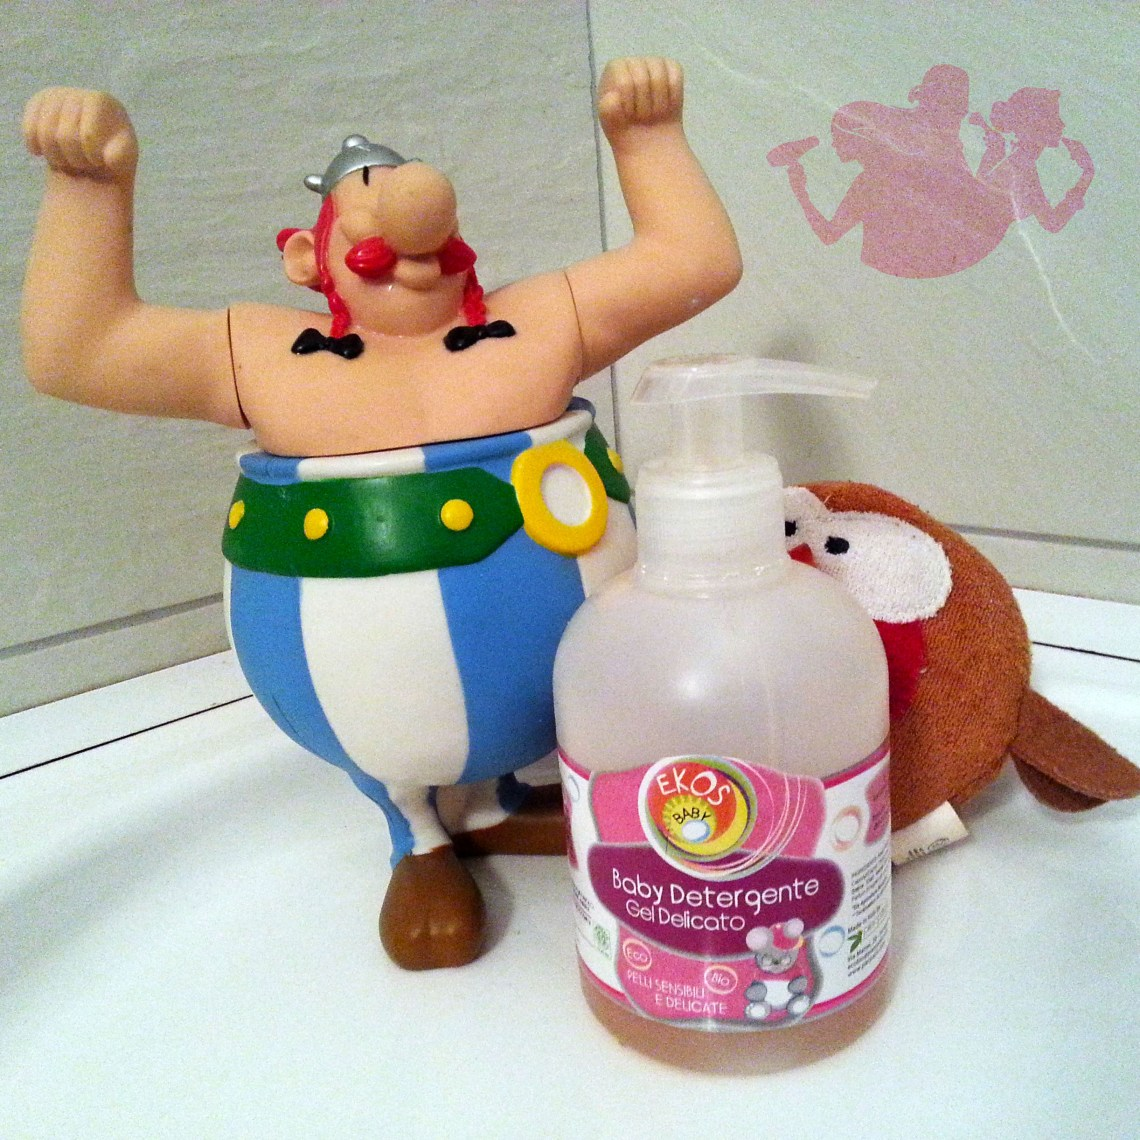 Baby detergente delicato Ekos